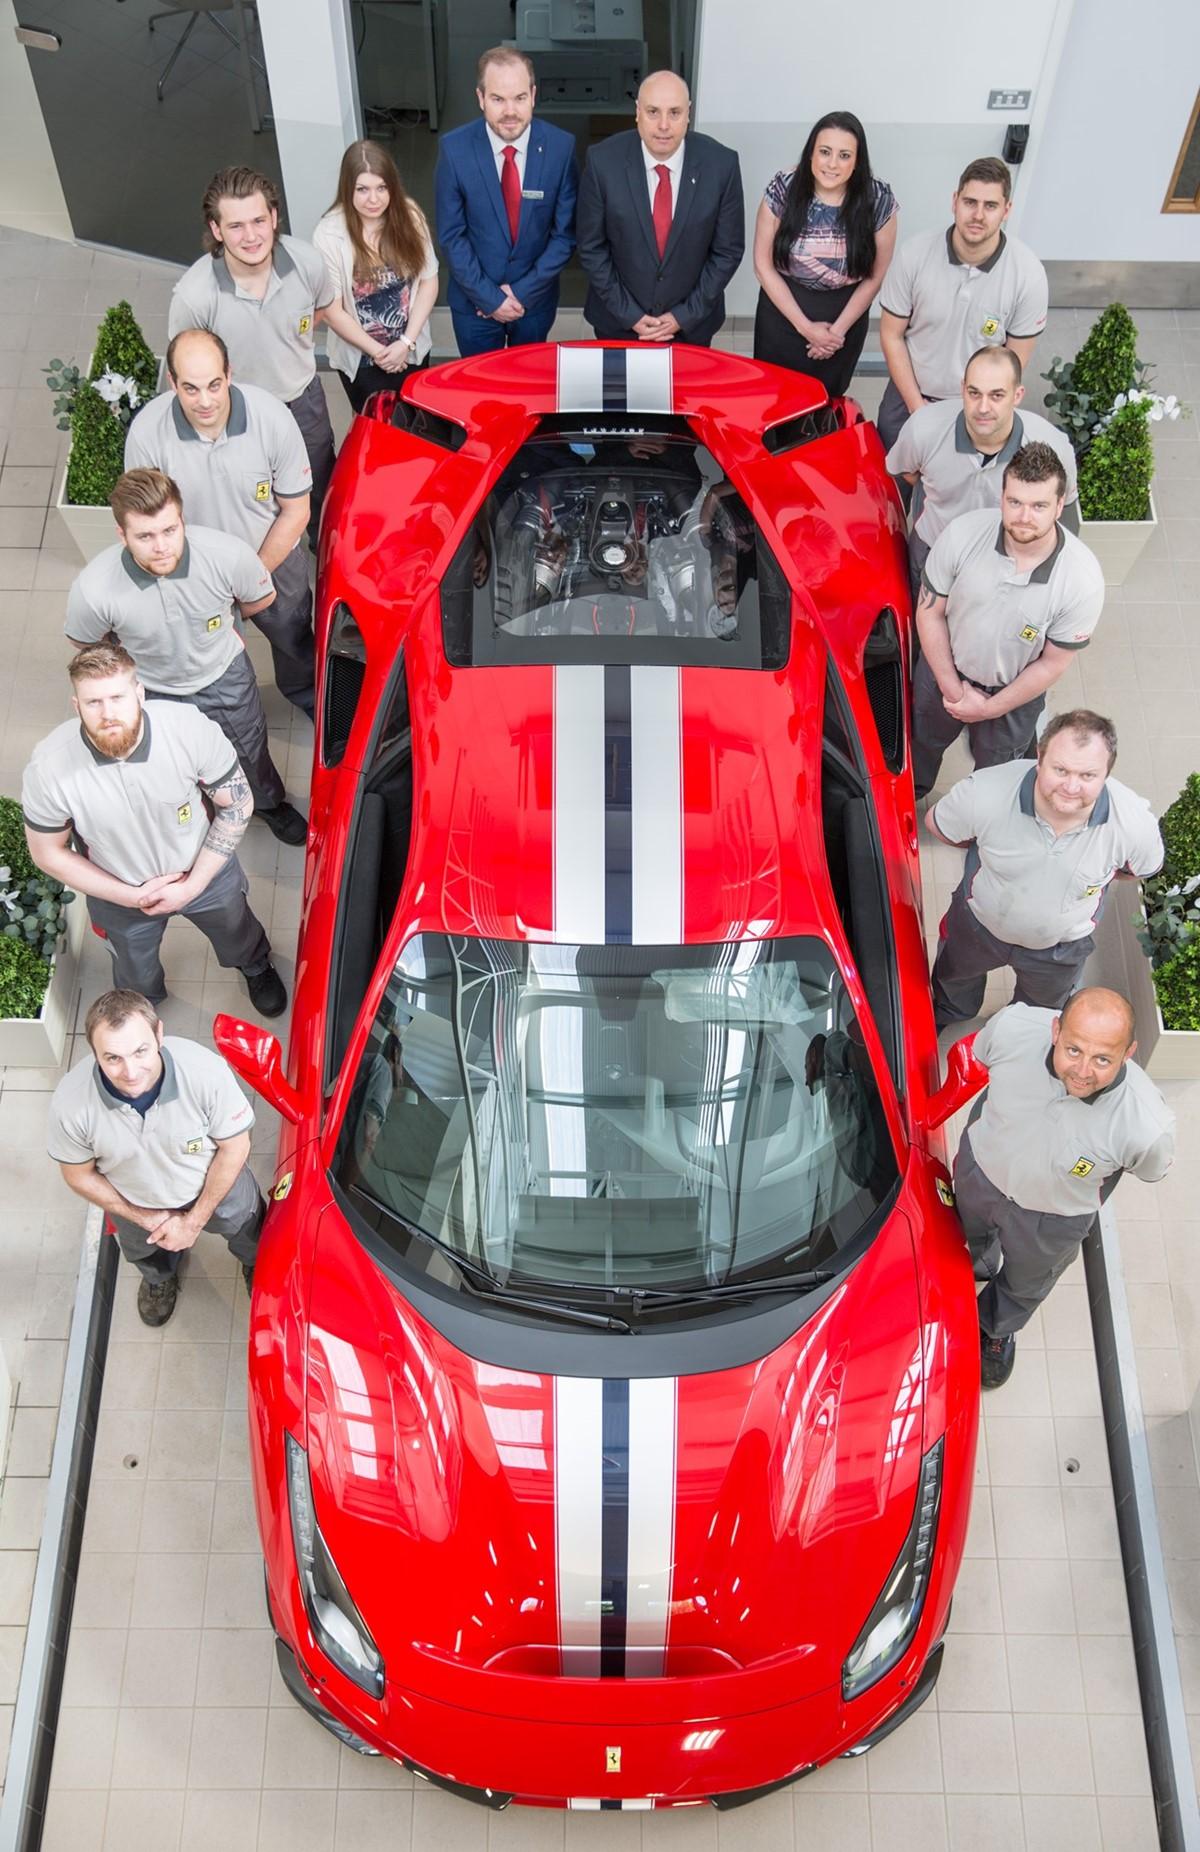 Dealer Meridien Modena Opens 3 5 Million Ferrari Service Centre In Hampshire Gallery Car Dealer News